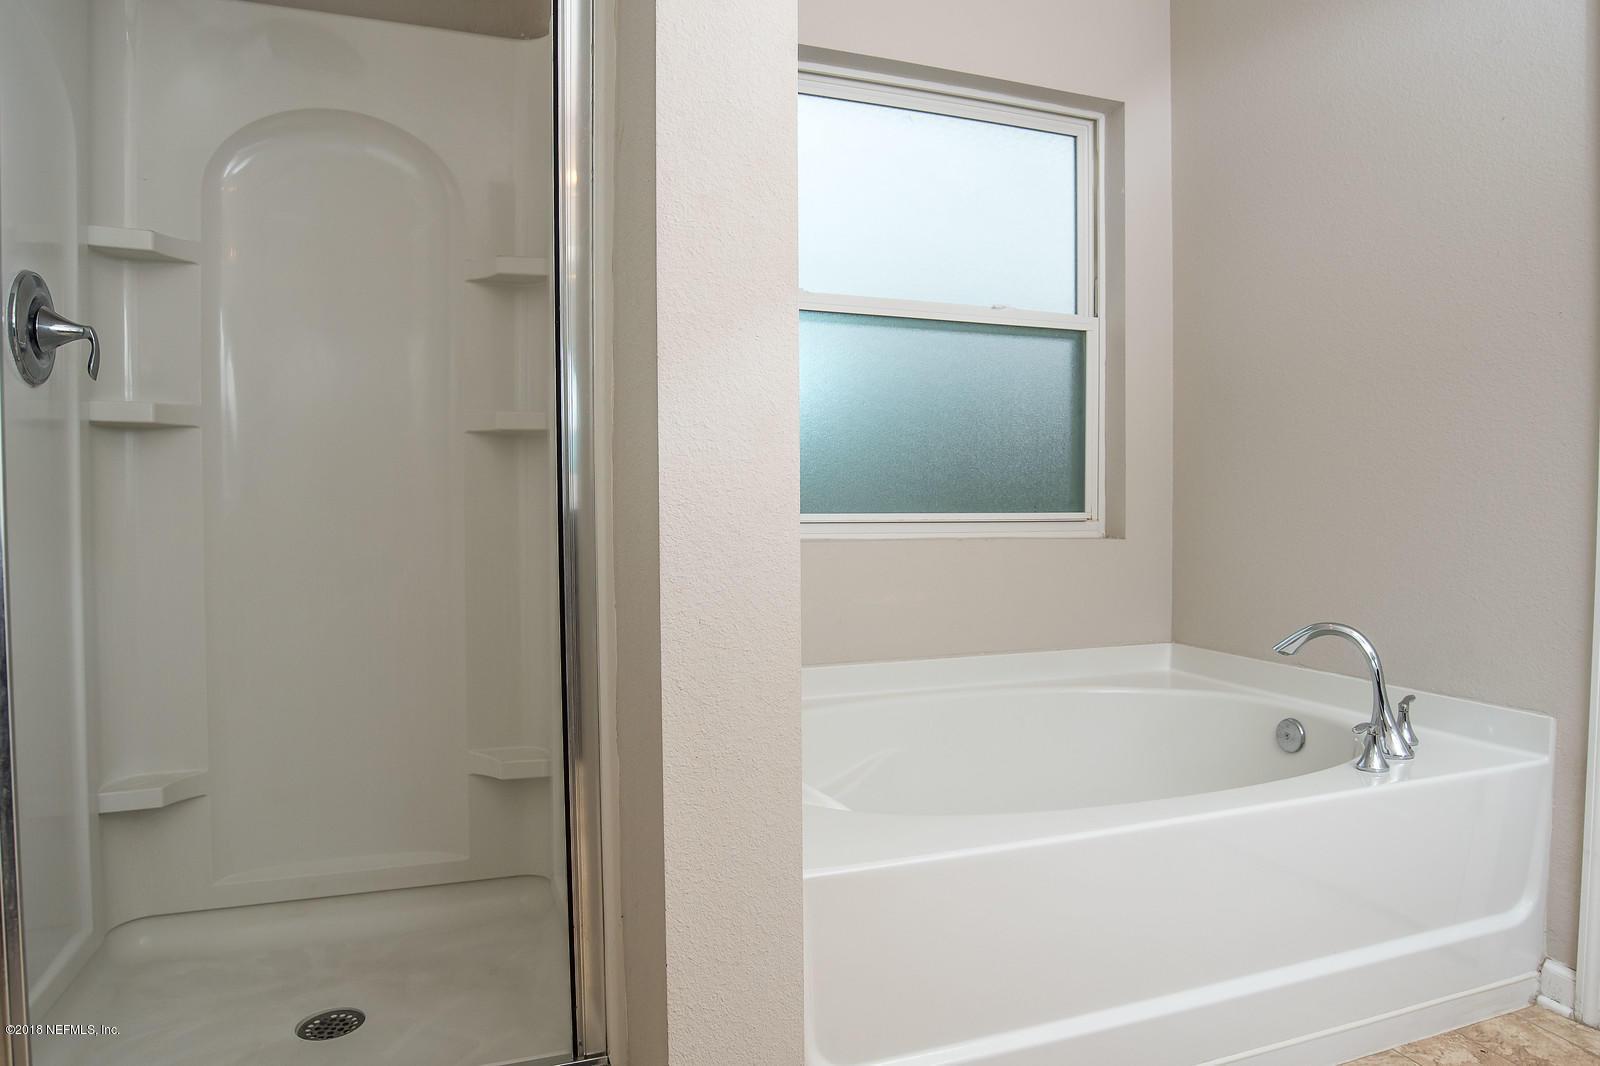 7413 STEVENTON, JACKSONVILLE, FLORIDA 32244, 4 Bedrooms Bedrooms, ,2 BathroomsBathrooms,Residential - single family,For sale,STEVENTON,965377